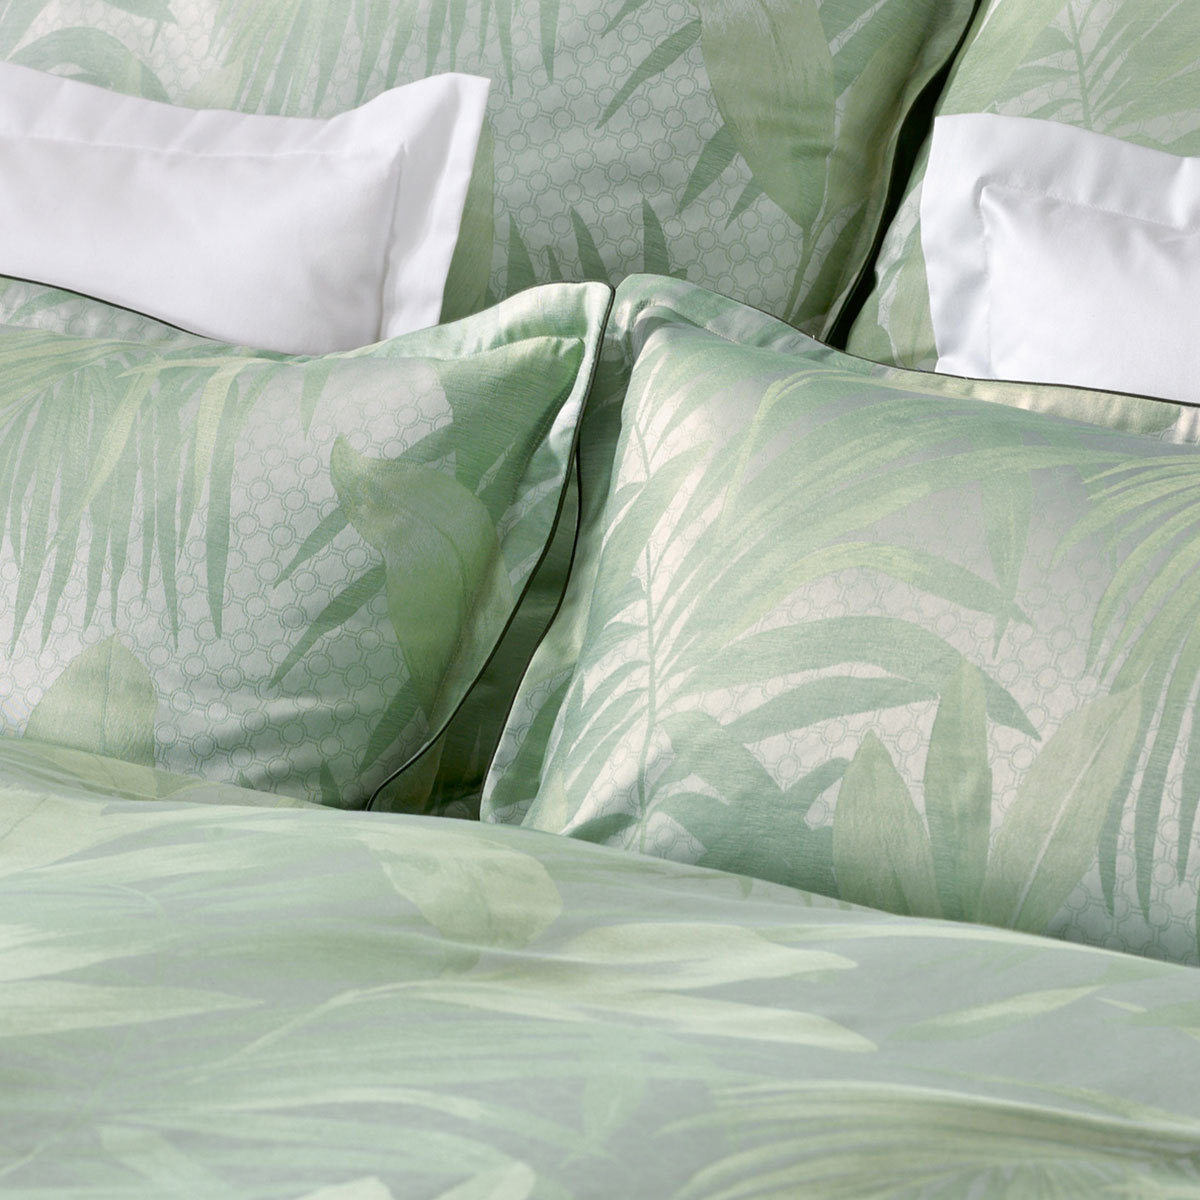 curt bauer mako brokat damast bettw sche cannes gr n. Black Bedroom Furniture Sets. Home Design Ideas